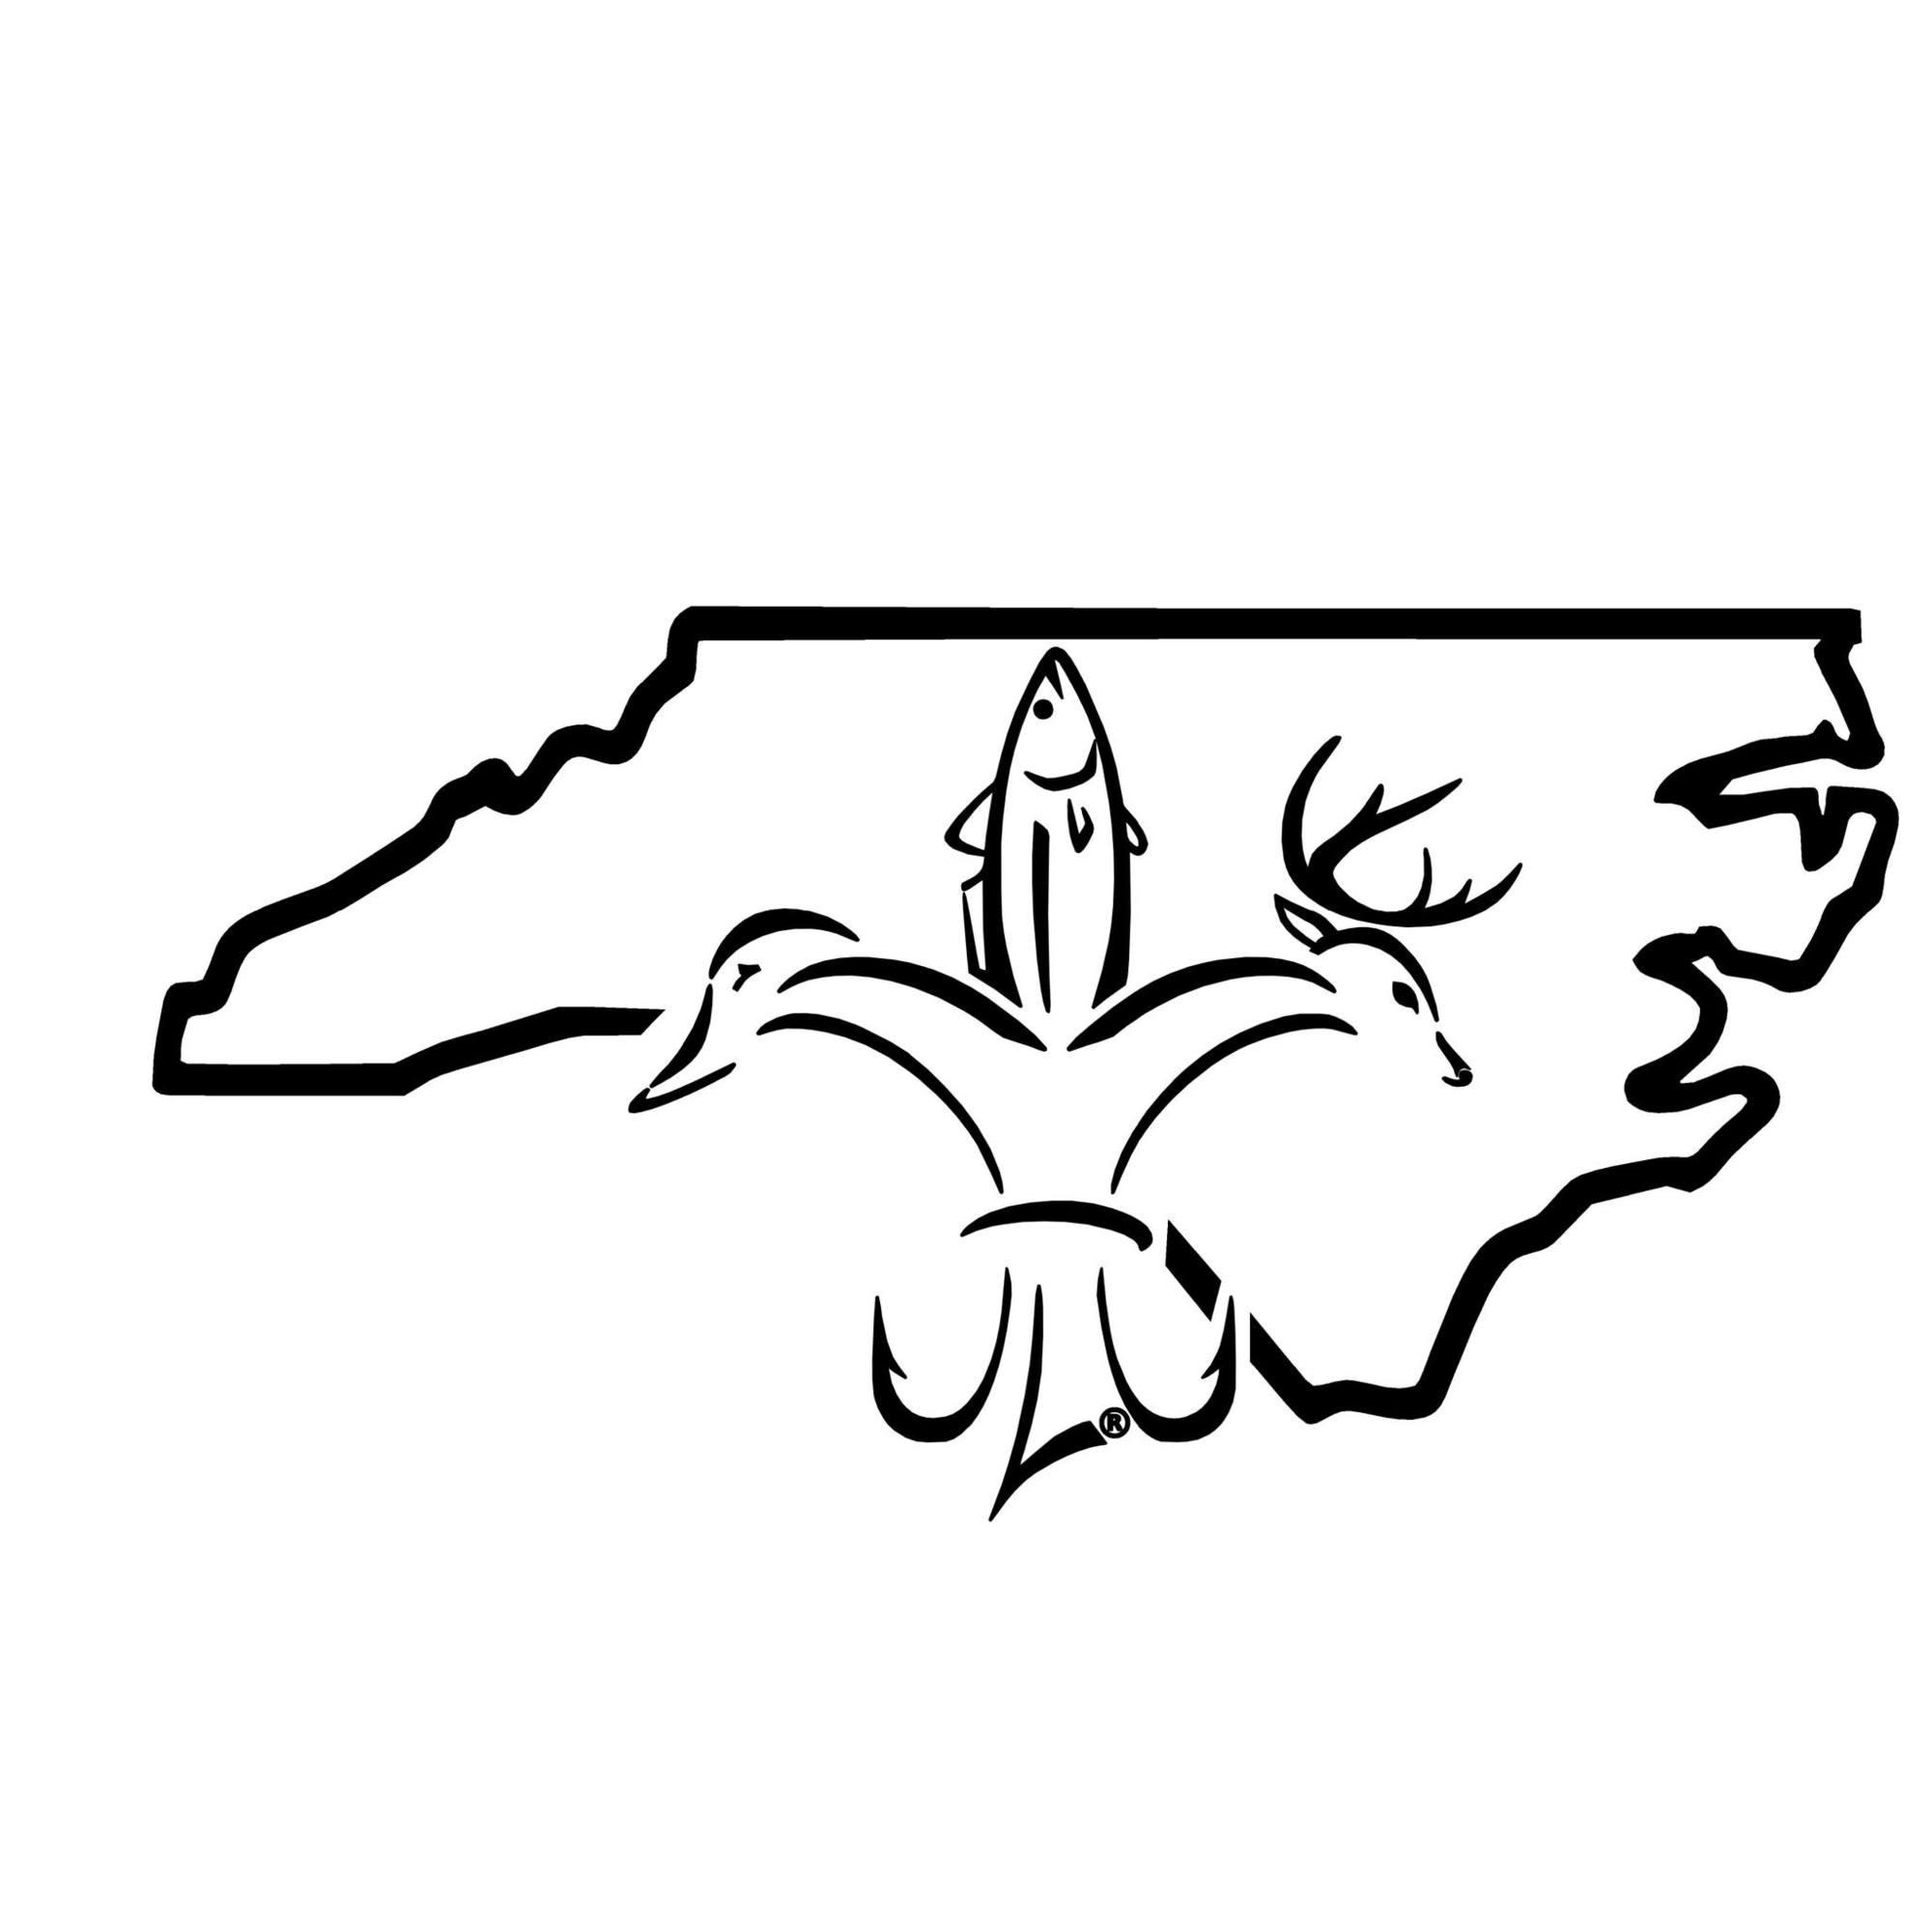 North Carolina Sportsman Decal.